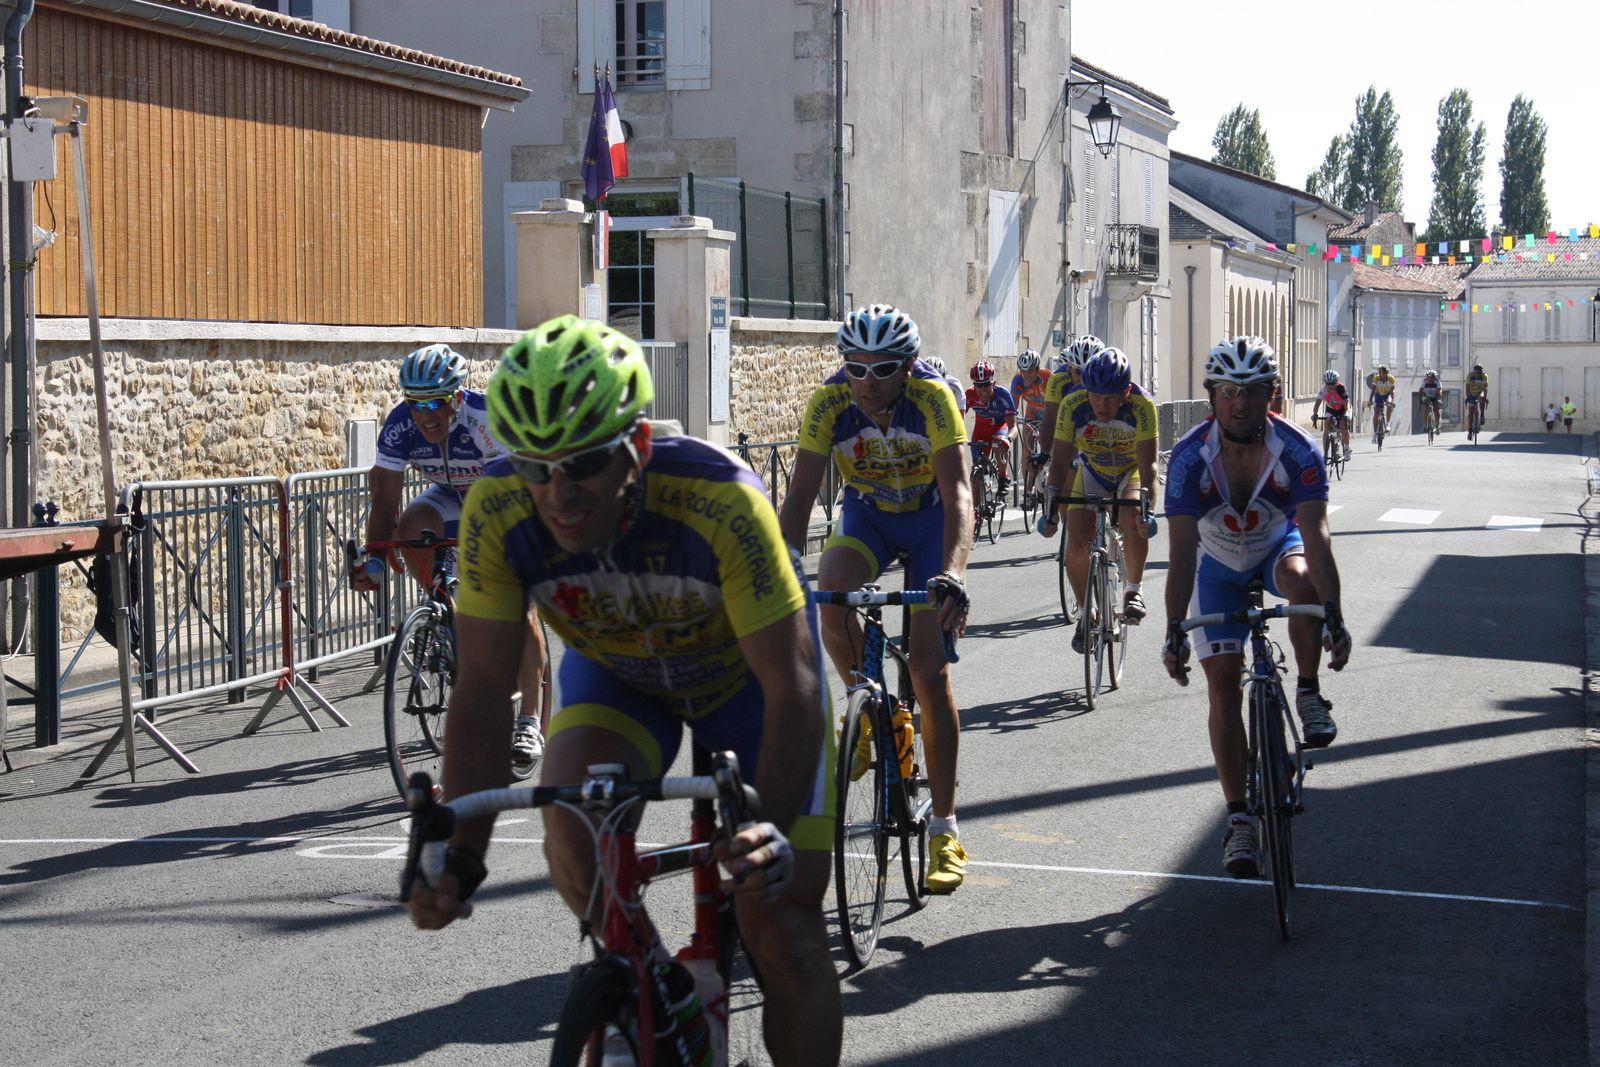 2e  Michel  REGEASSE(VC  Montendre), 3e  Daniel  GILLEREAU(NL), 4e  Igor  DESAPHY(VC Le Gua), 5e  Pascal  BARADEAU(VC  Saintes), 6e  Alain  PREVOT(R  Guataise), 7e  Bertrand  THEBAULT (ES P  Guichen), 8e  Christian  LABROUSSE(R  Guataise), 9e  Jacky  GAILLARD(R Guataise),